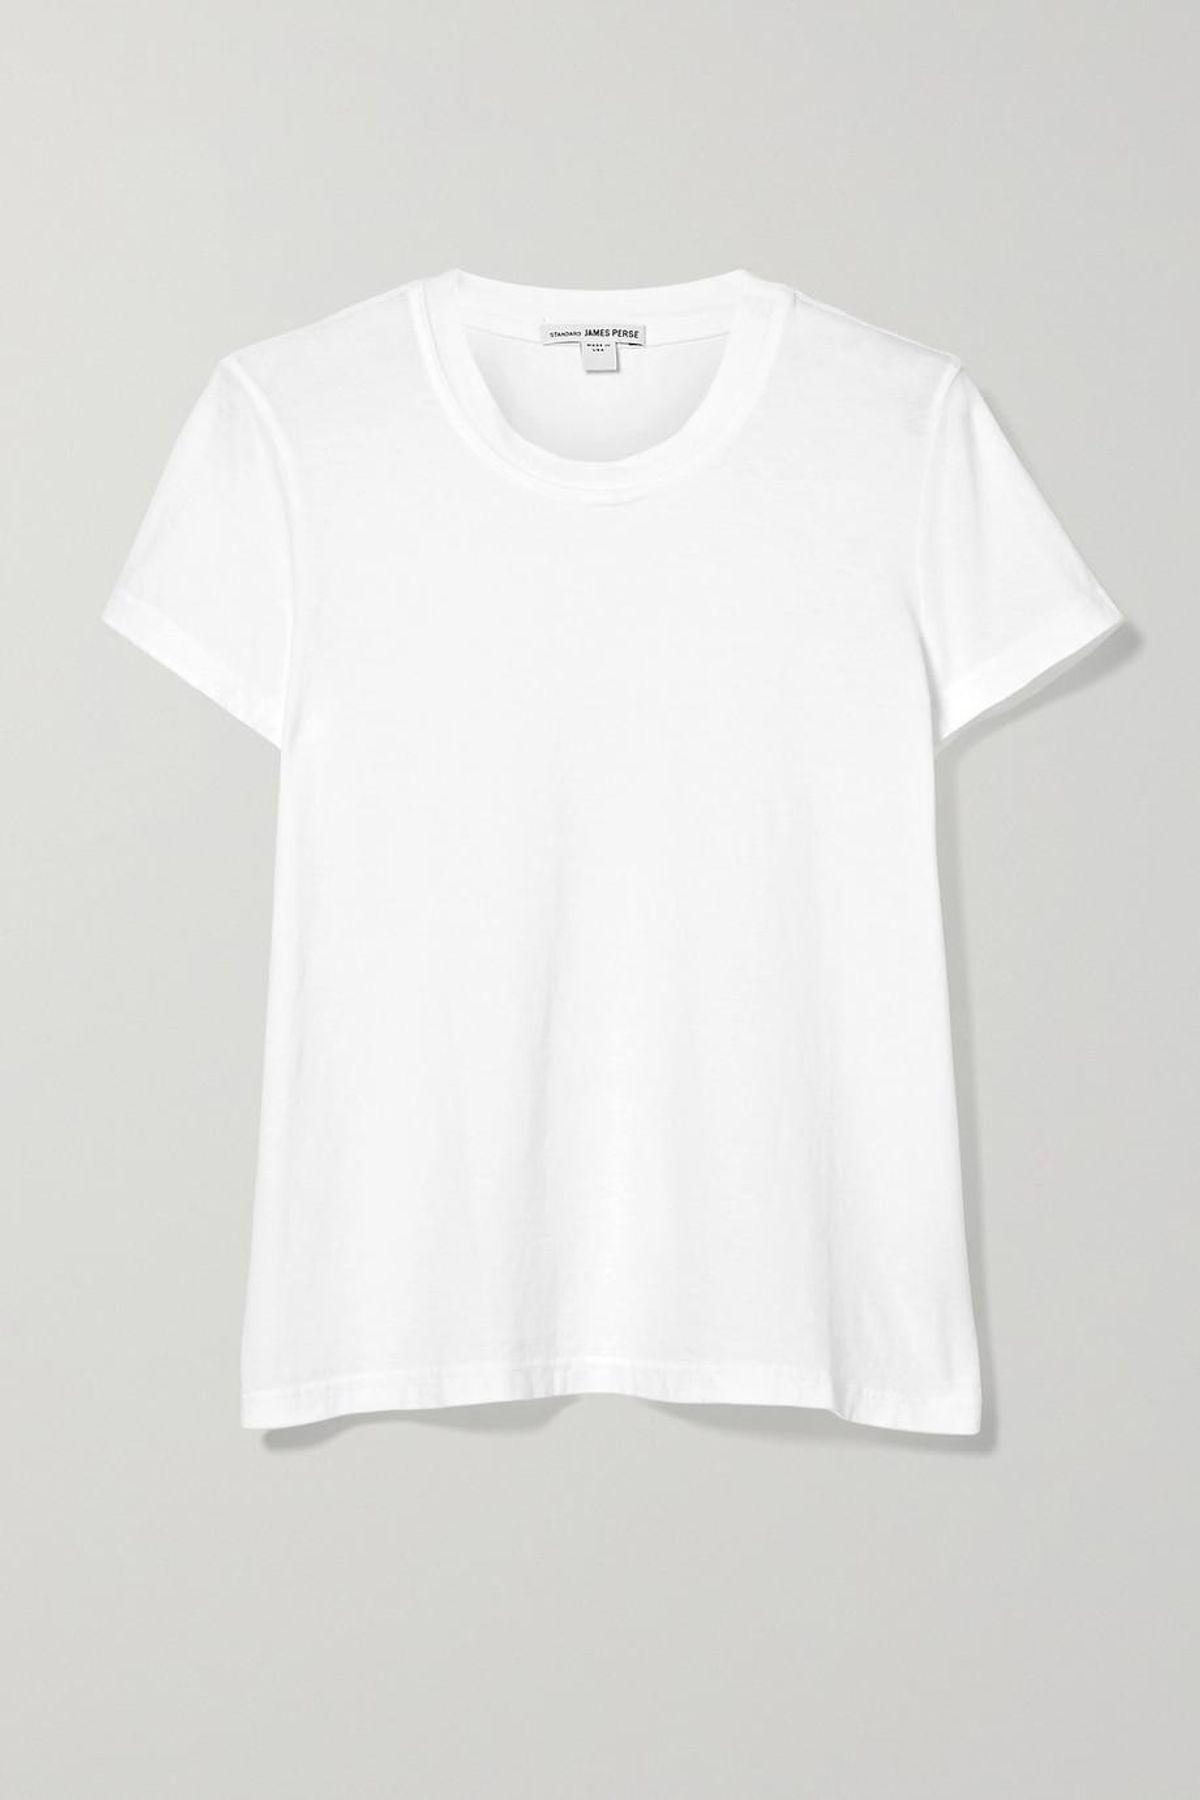 james perse vintage boy cotton jersey t shirt